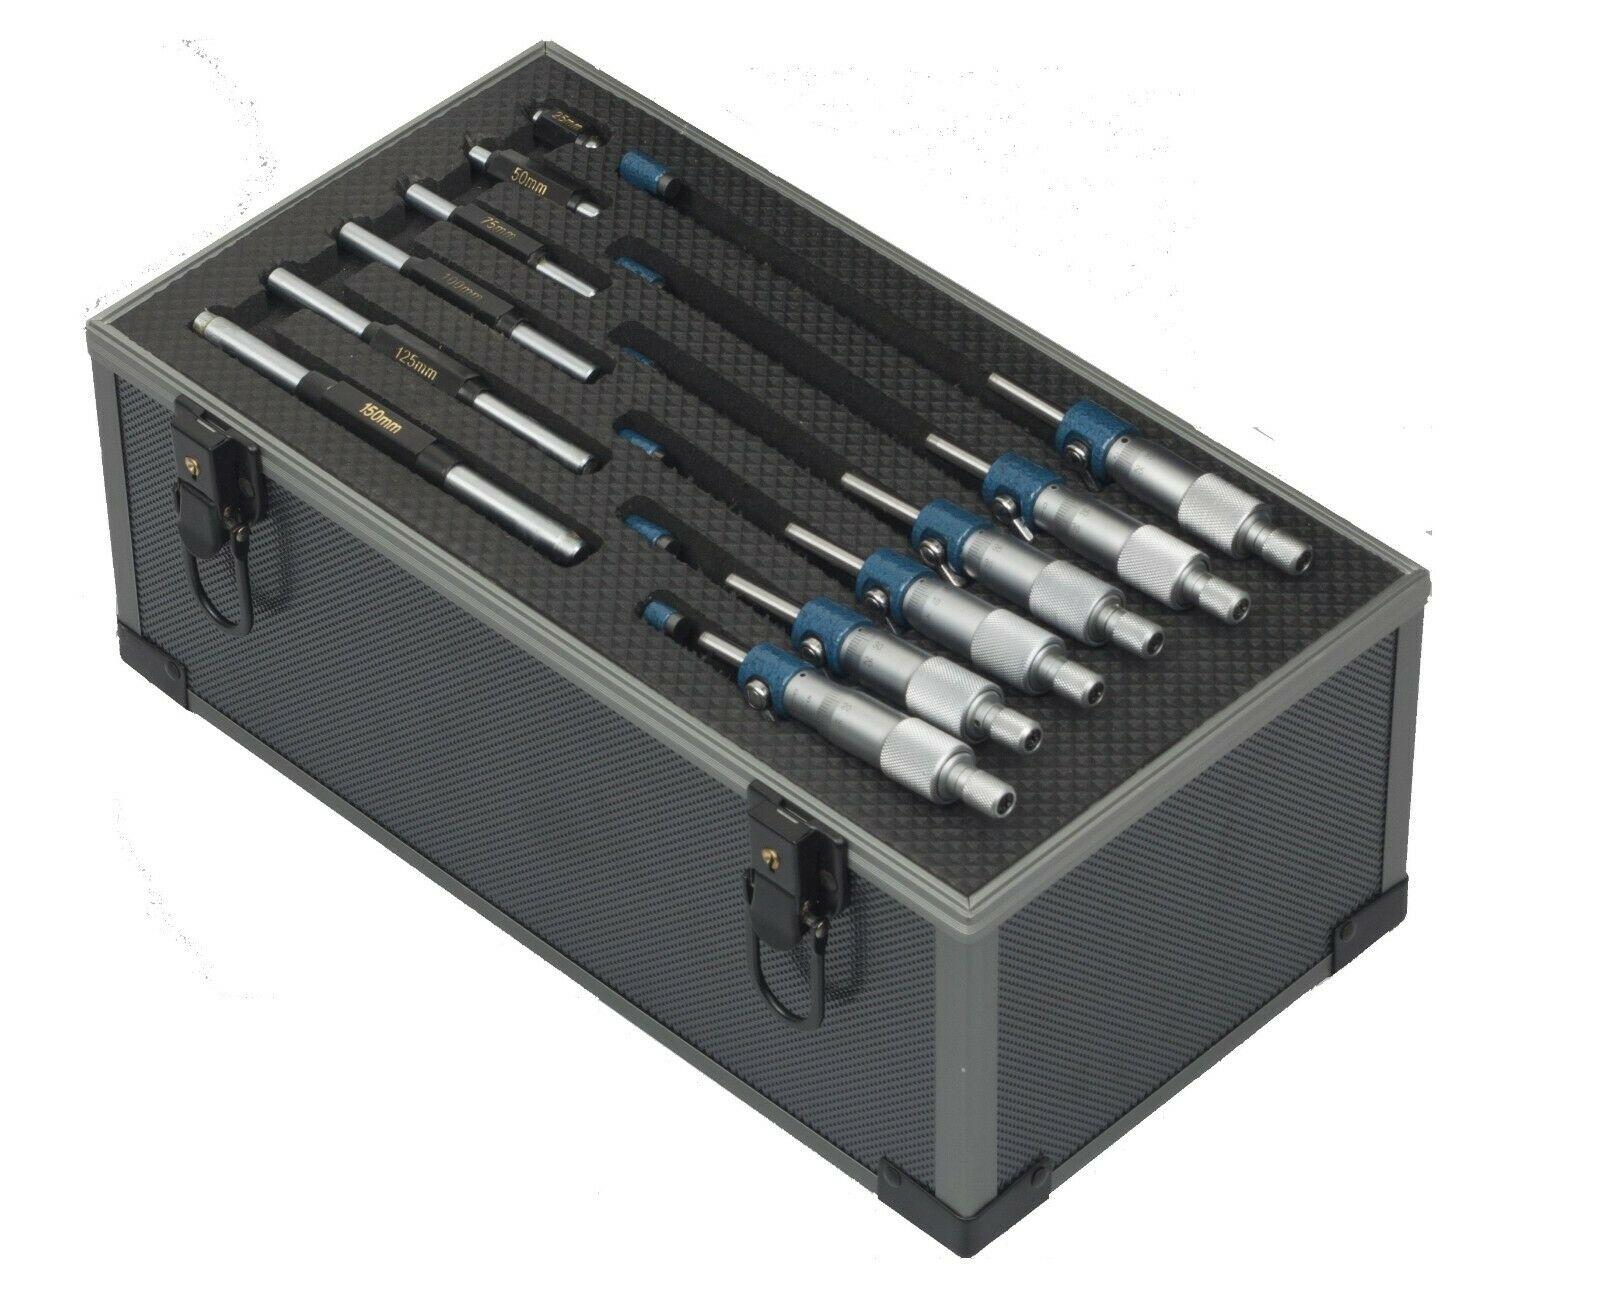 150 mm x 0.01 Range Metric Graduation. Dasqua 6 Pc Outside Micrometer Set 0